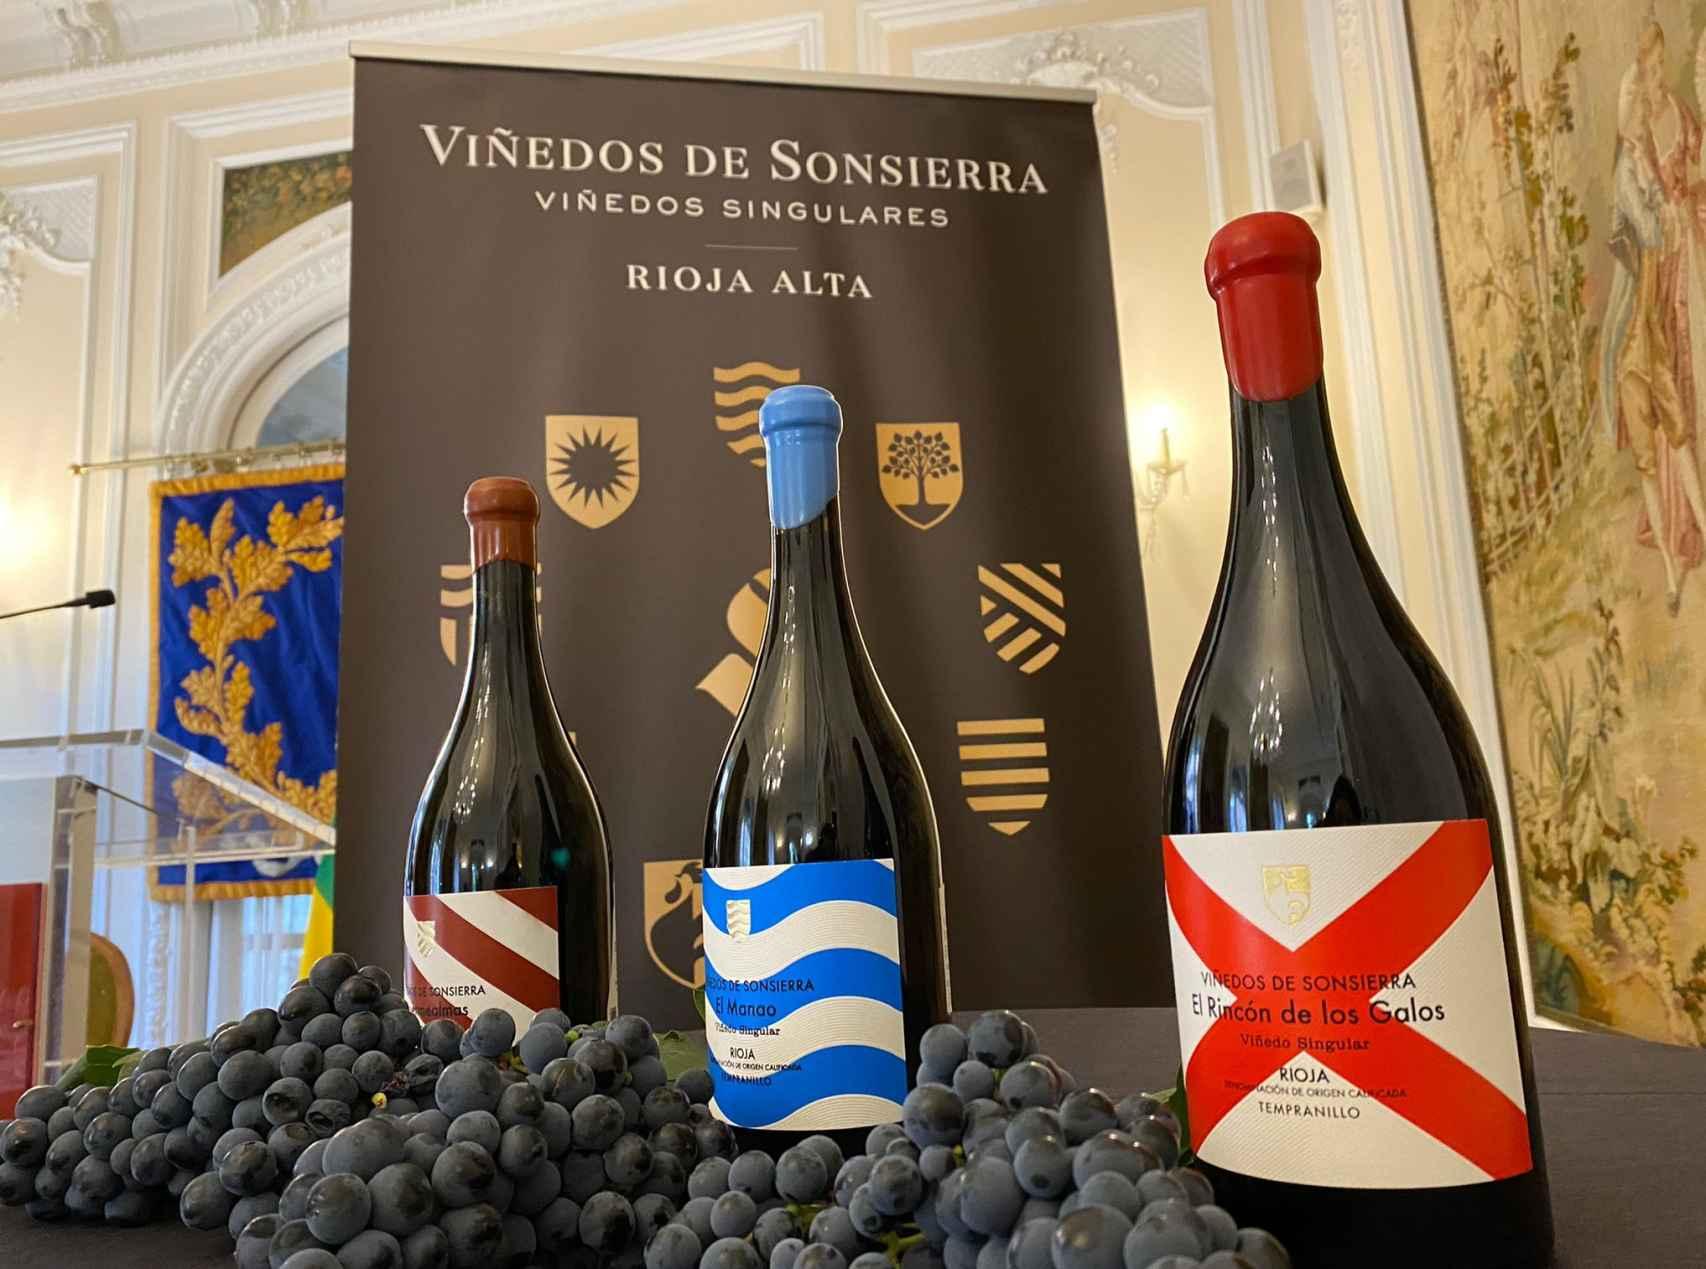 Viñedos de Sonsierra, Viñedos SIngulares.